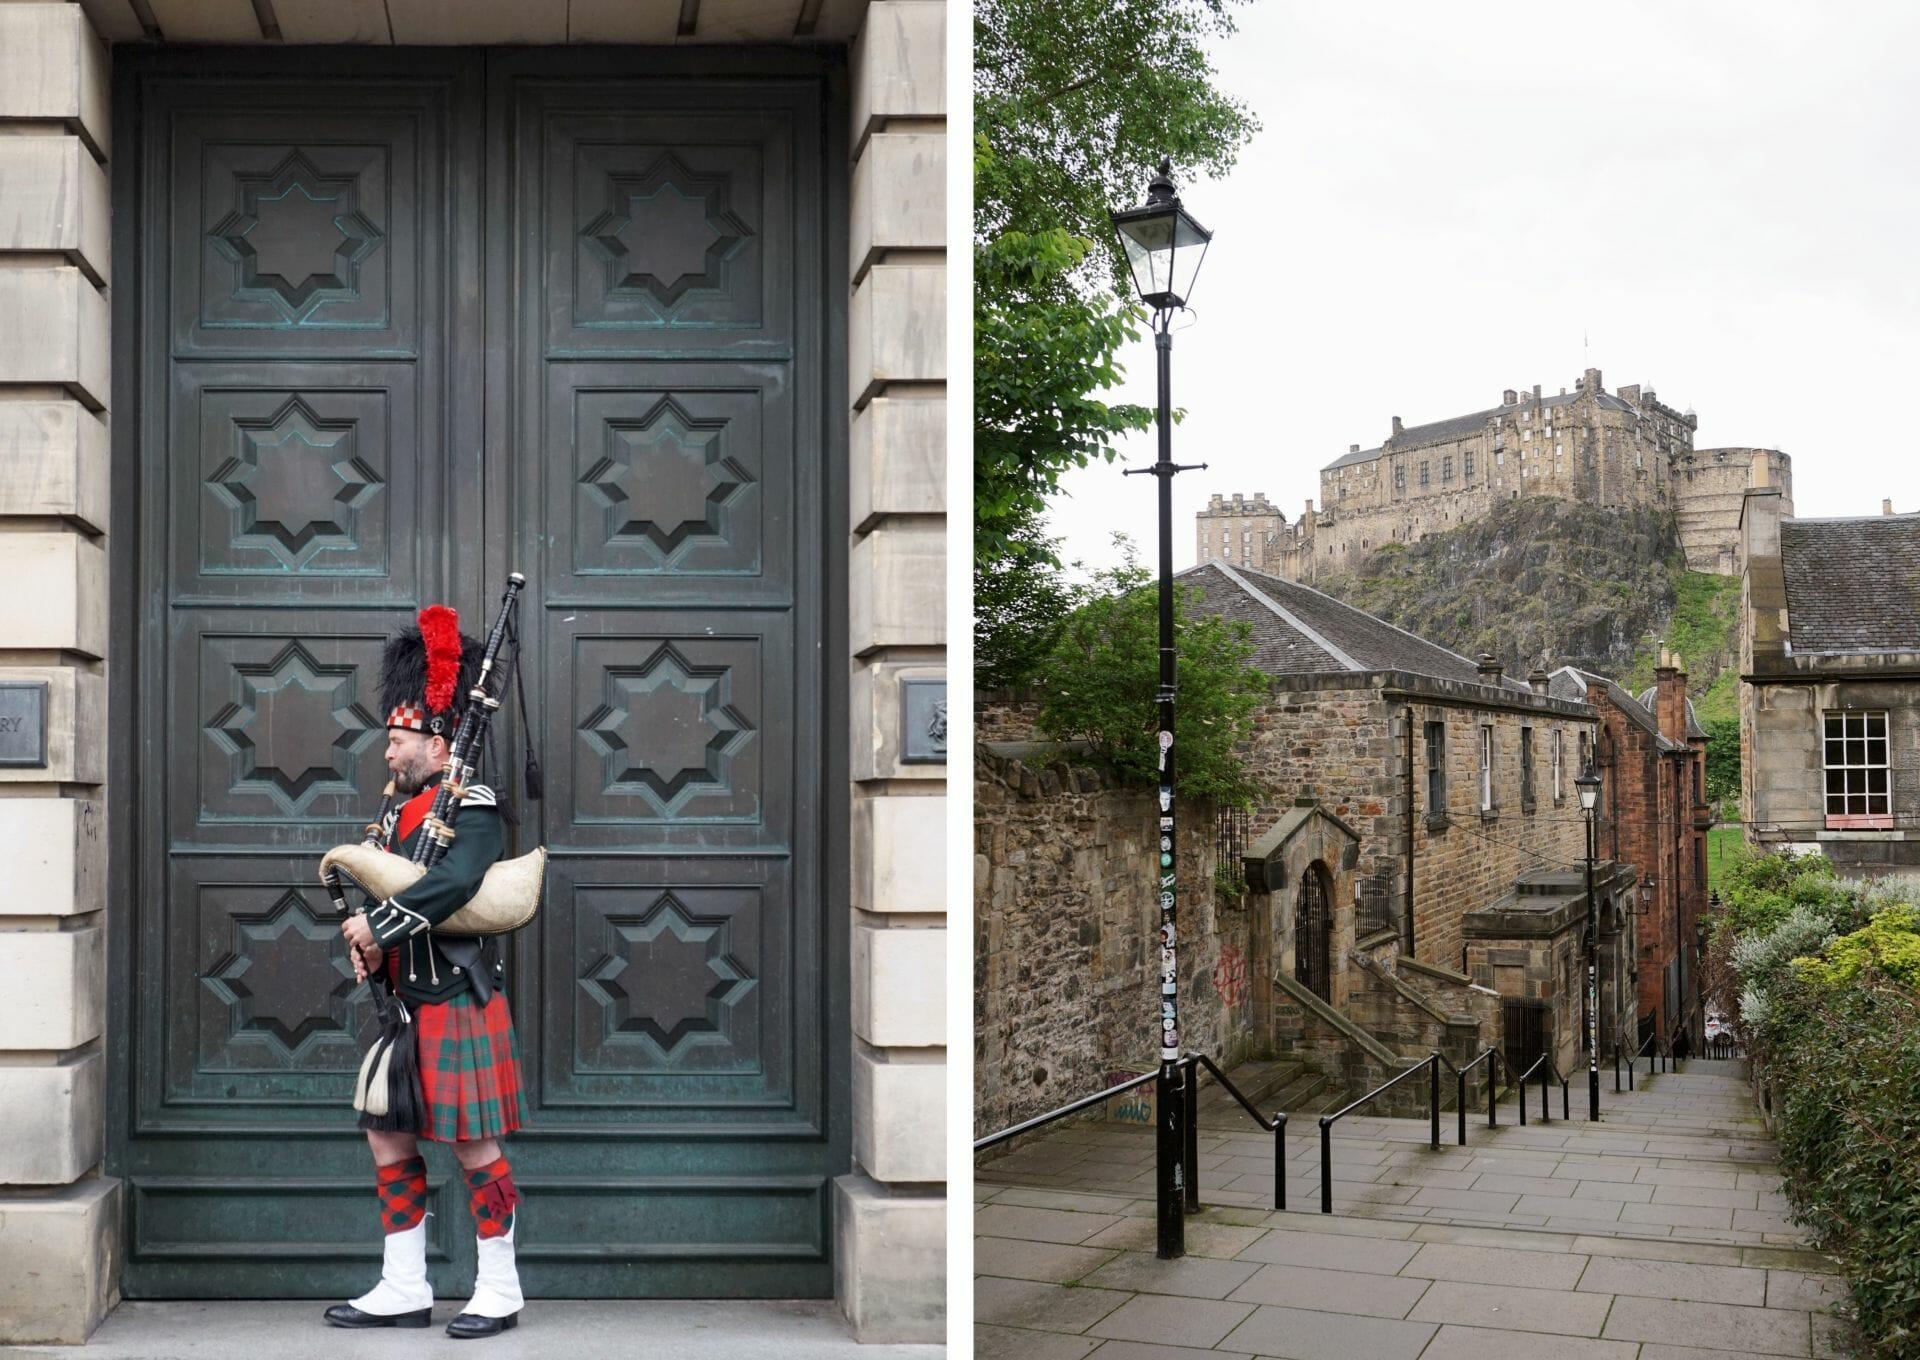 Edinburgh Castle and pipier